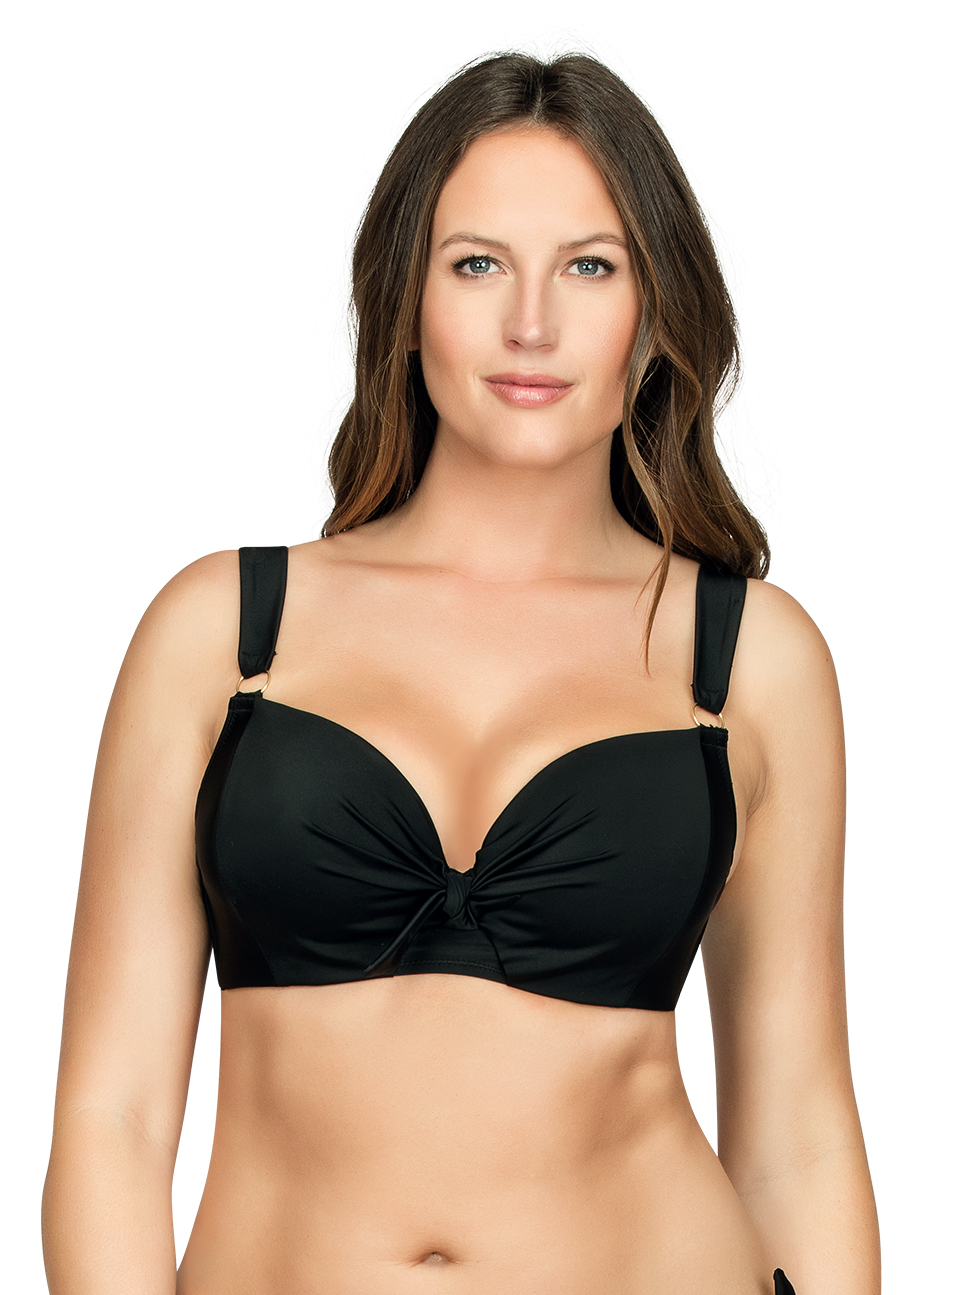 PARFAIT Oceane SoftPaddedBikiniTopS8061 Black Front1 - Oceane Soft-Padded Bikini Top Black S8061